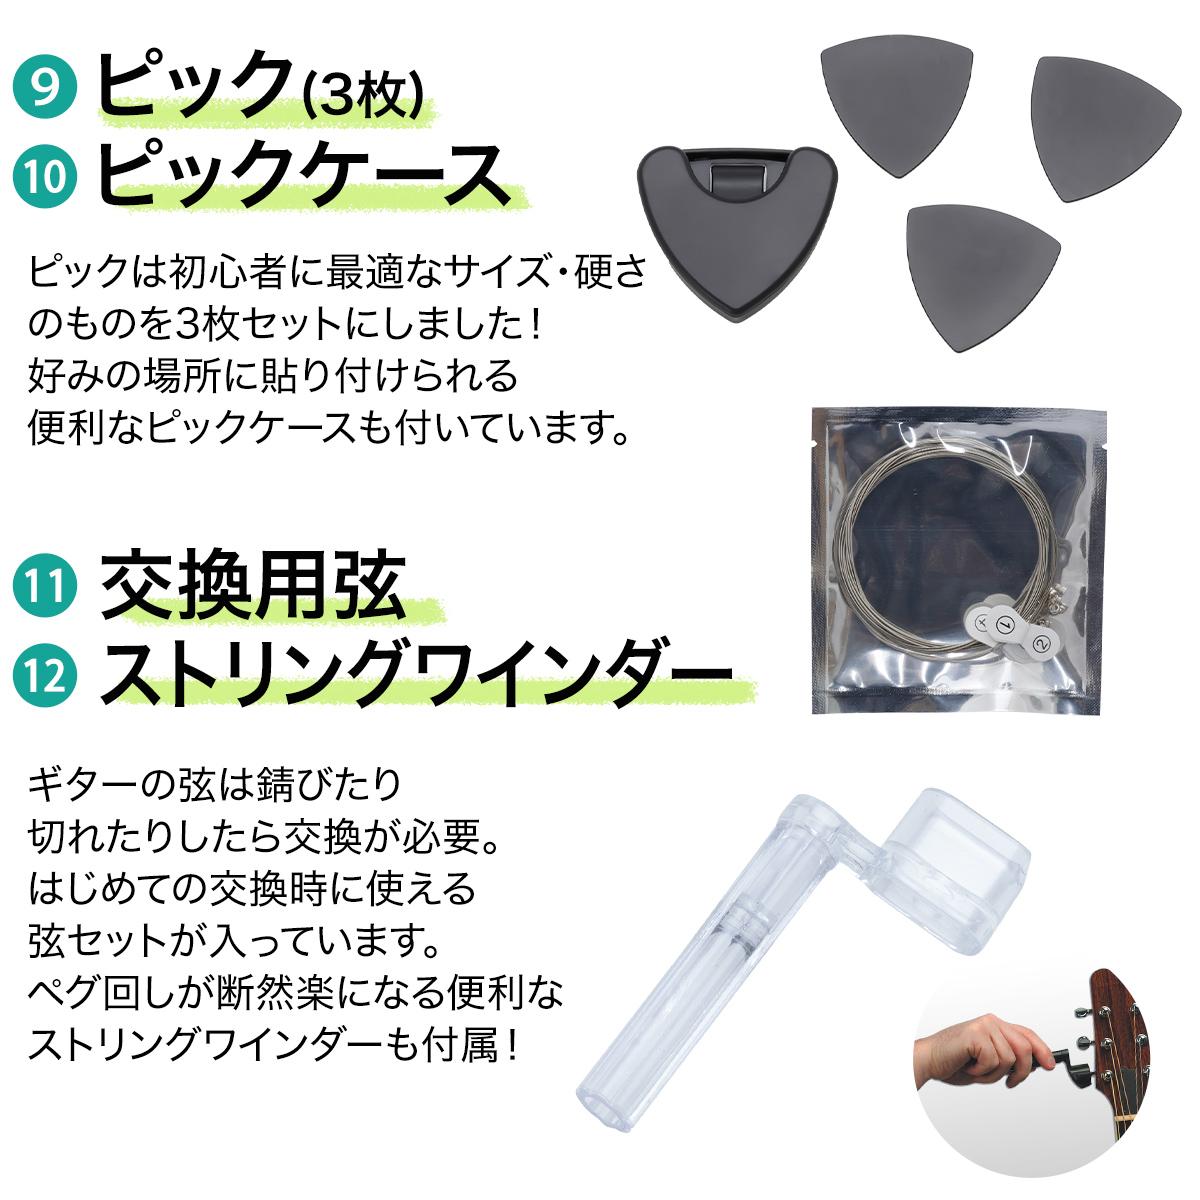 https://image.rakuten.co.jp/shimamuragakki/cabinet/set/01a/eg14set_ymhmn_4.jpg